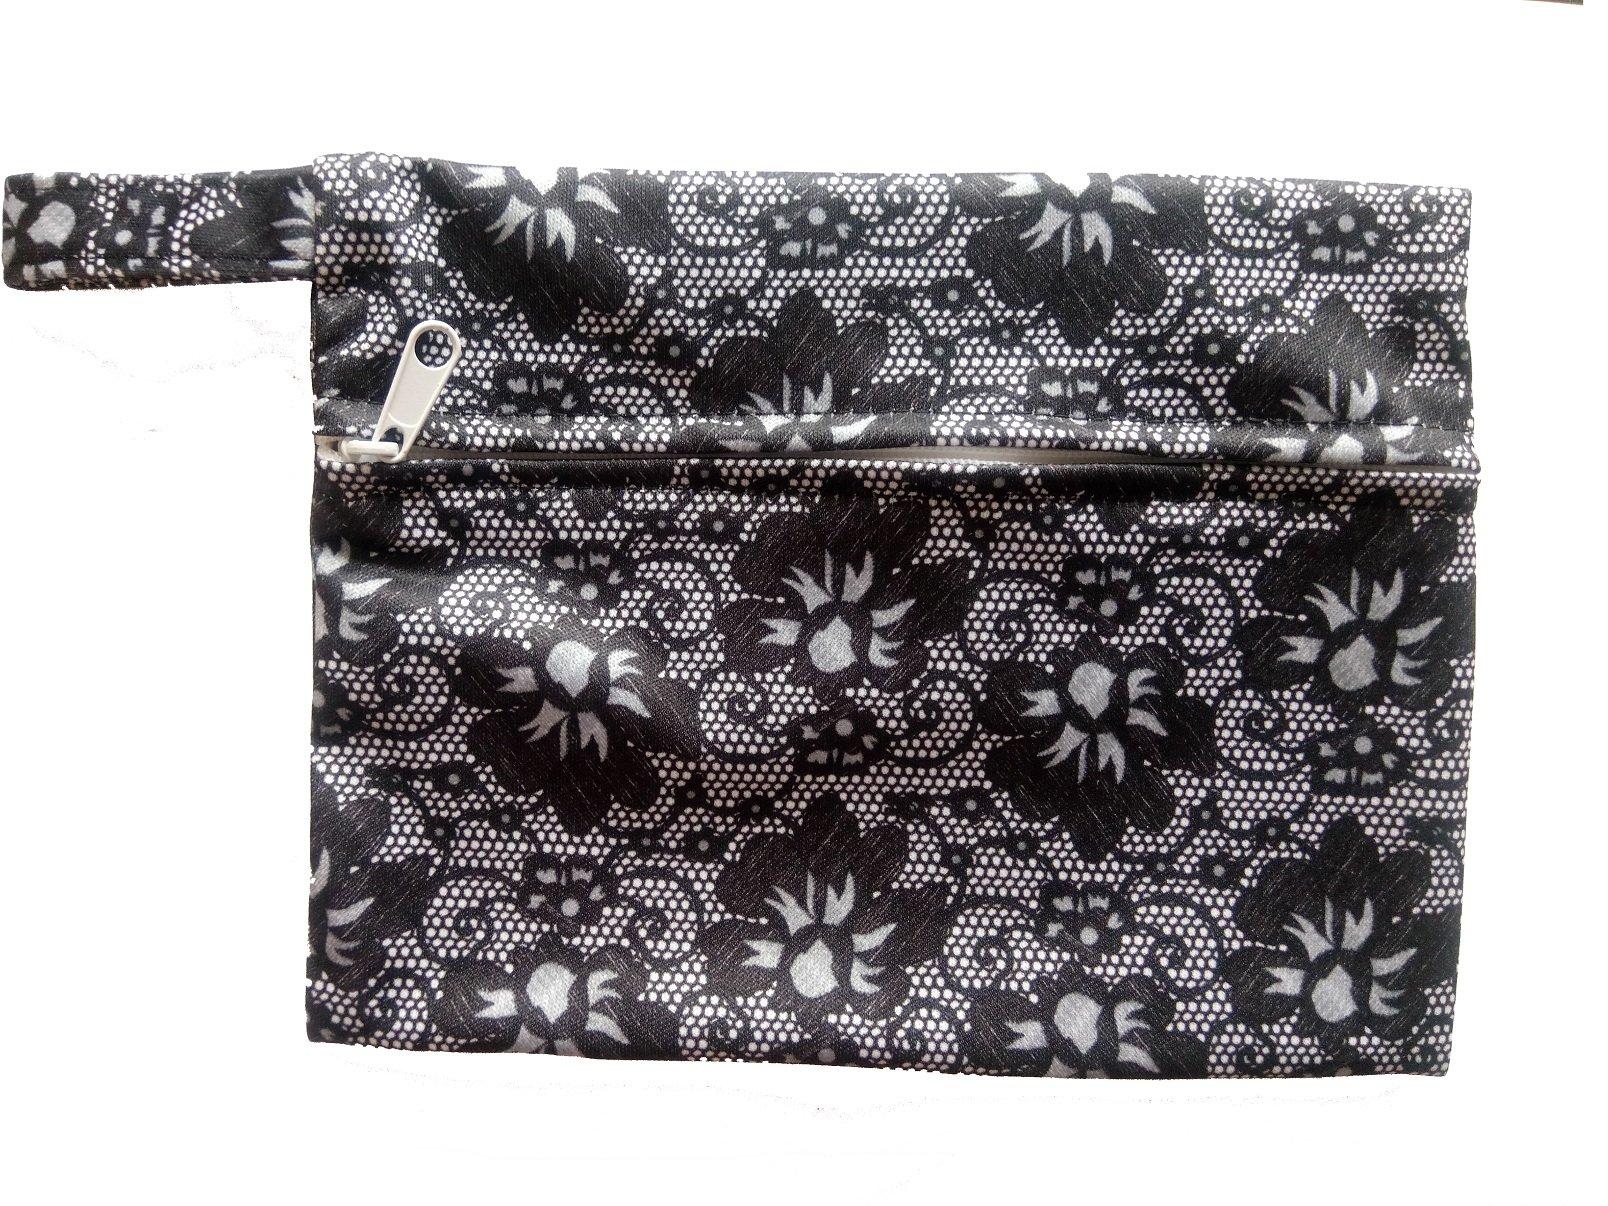 Mini Wet Bags for Breast pads sanitary napkin Maternity Mama Pads (2 PCS, WSDD10)